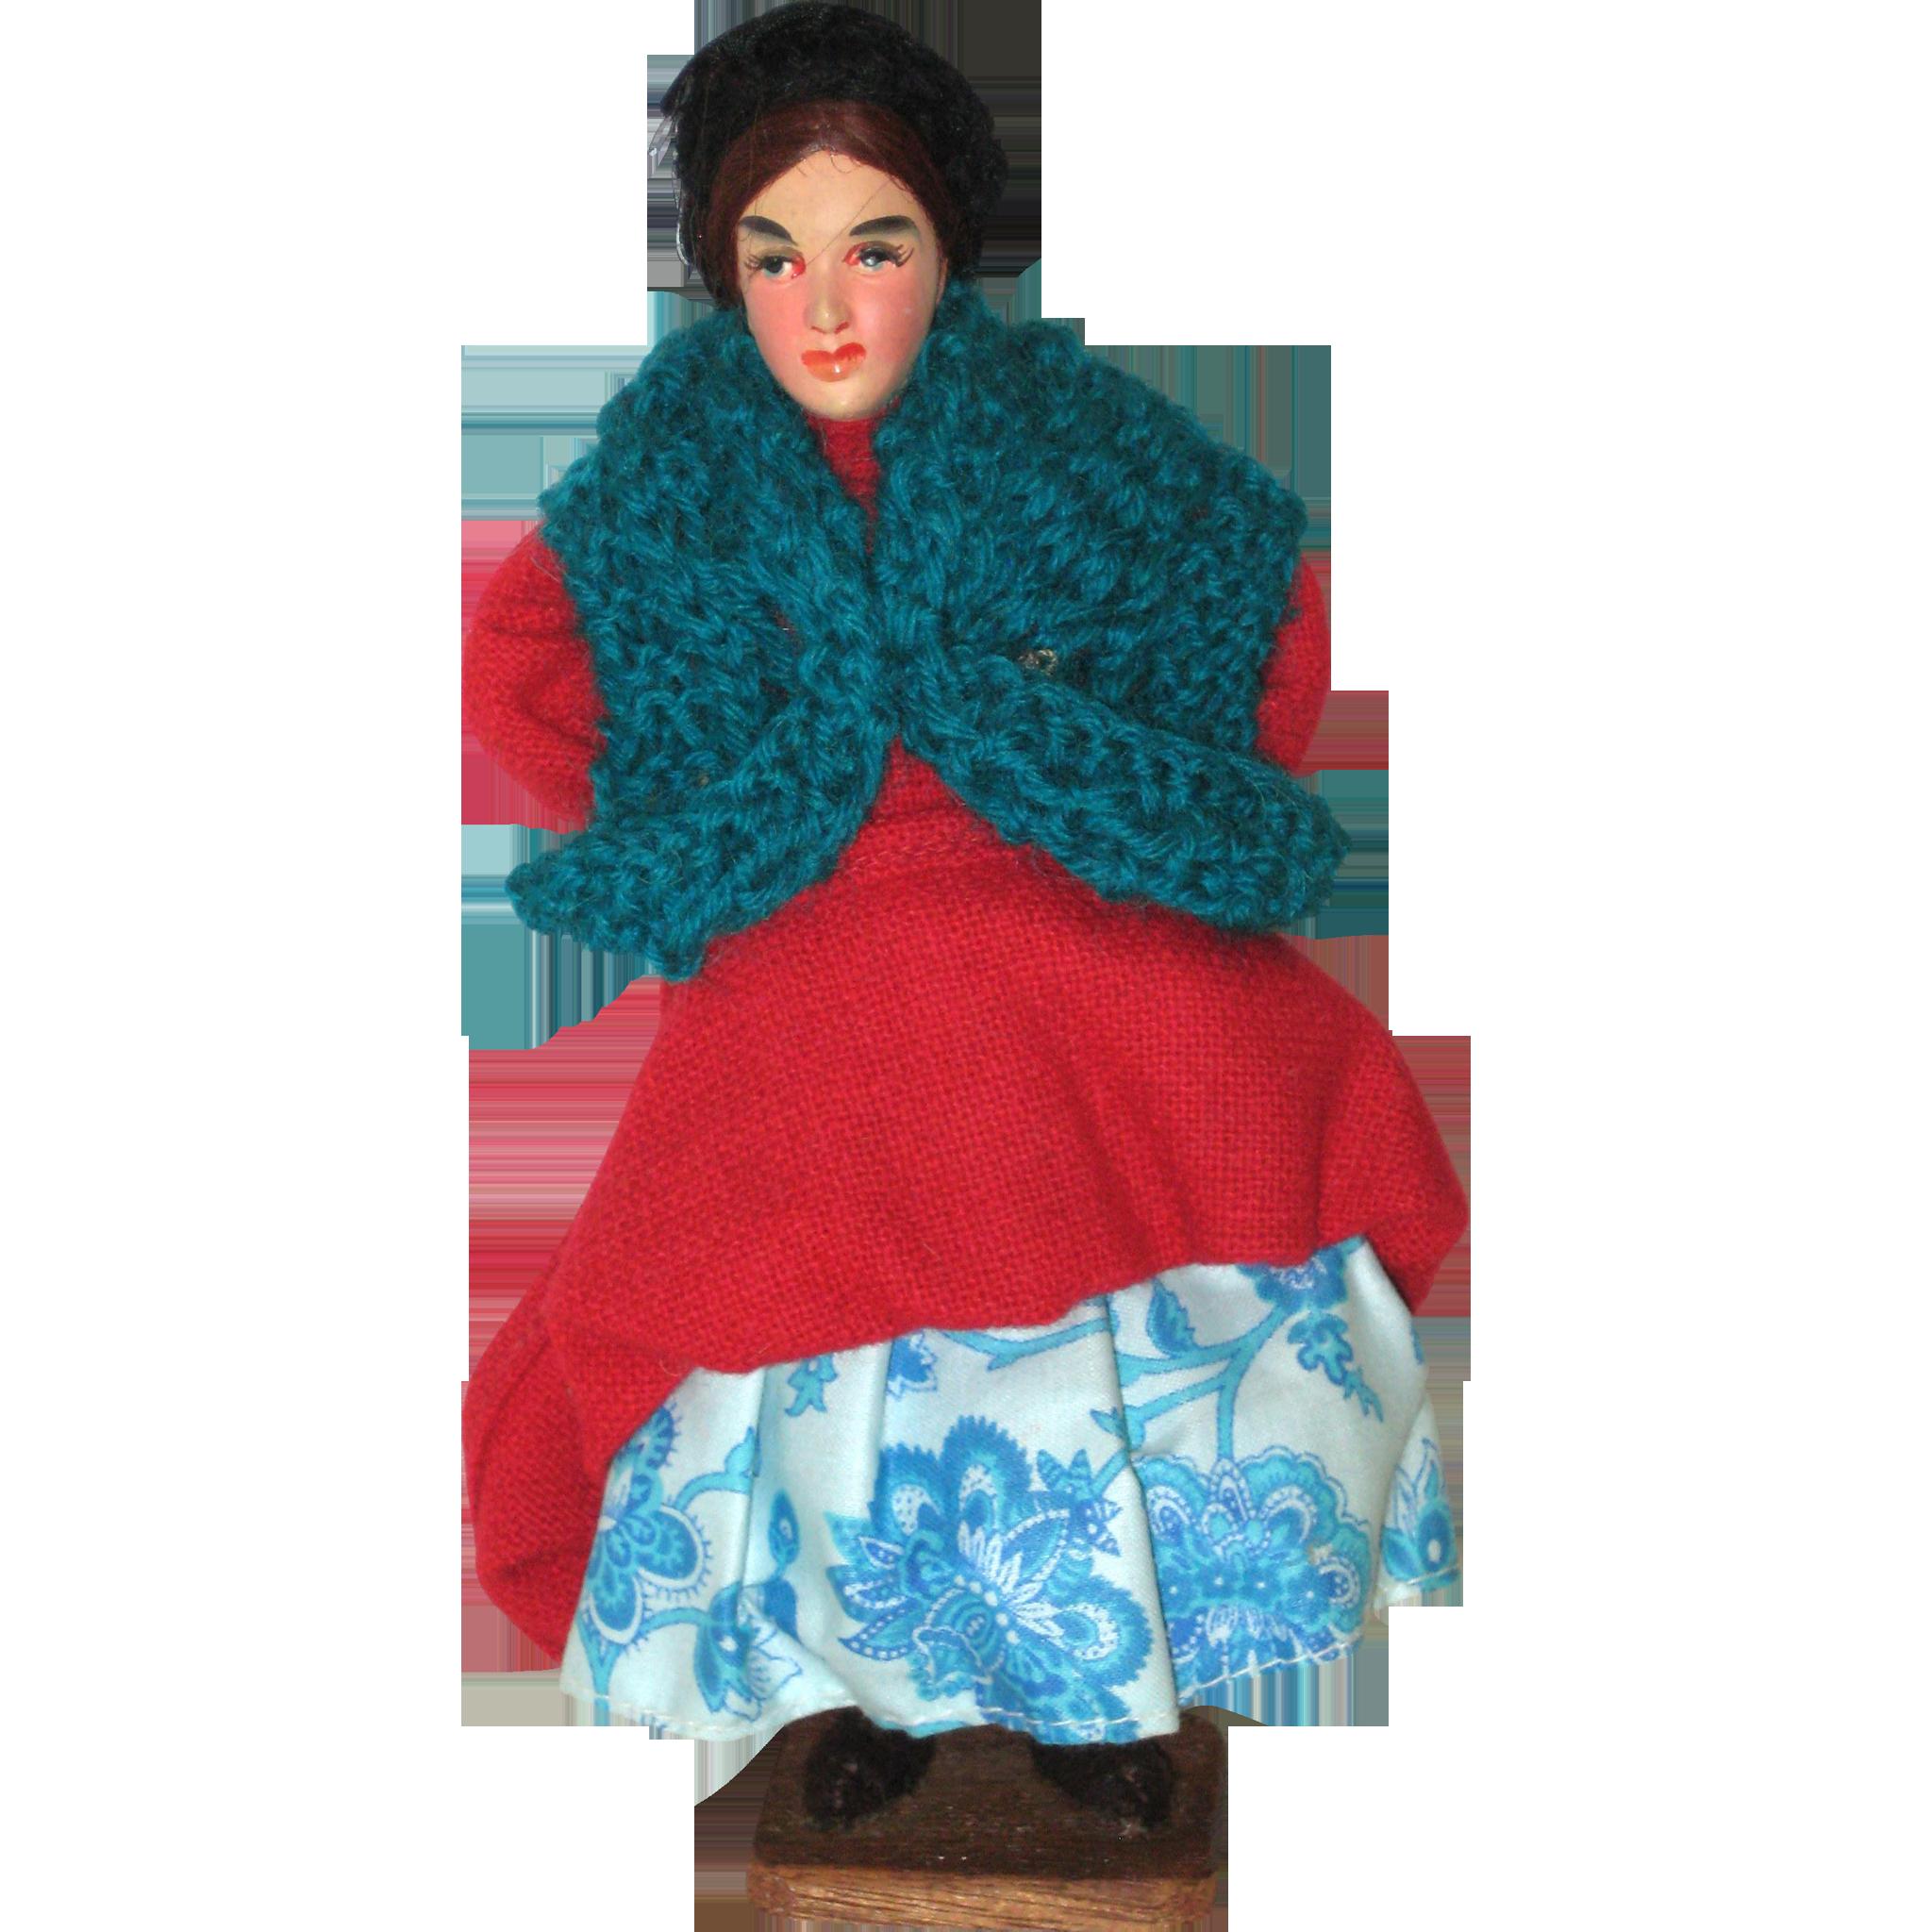 Jay of Dublin Irish Character Doll W5/6 - Sligo Woman